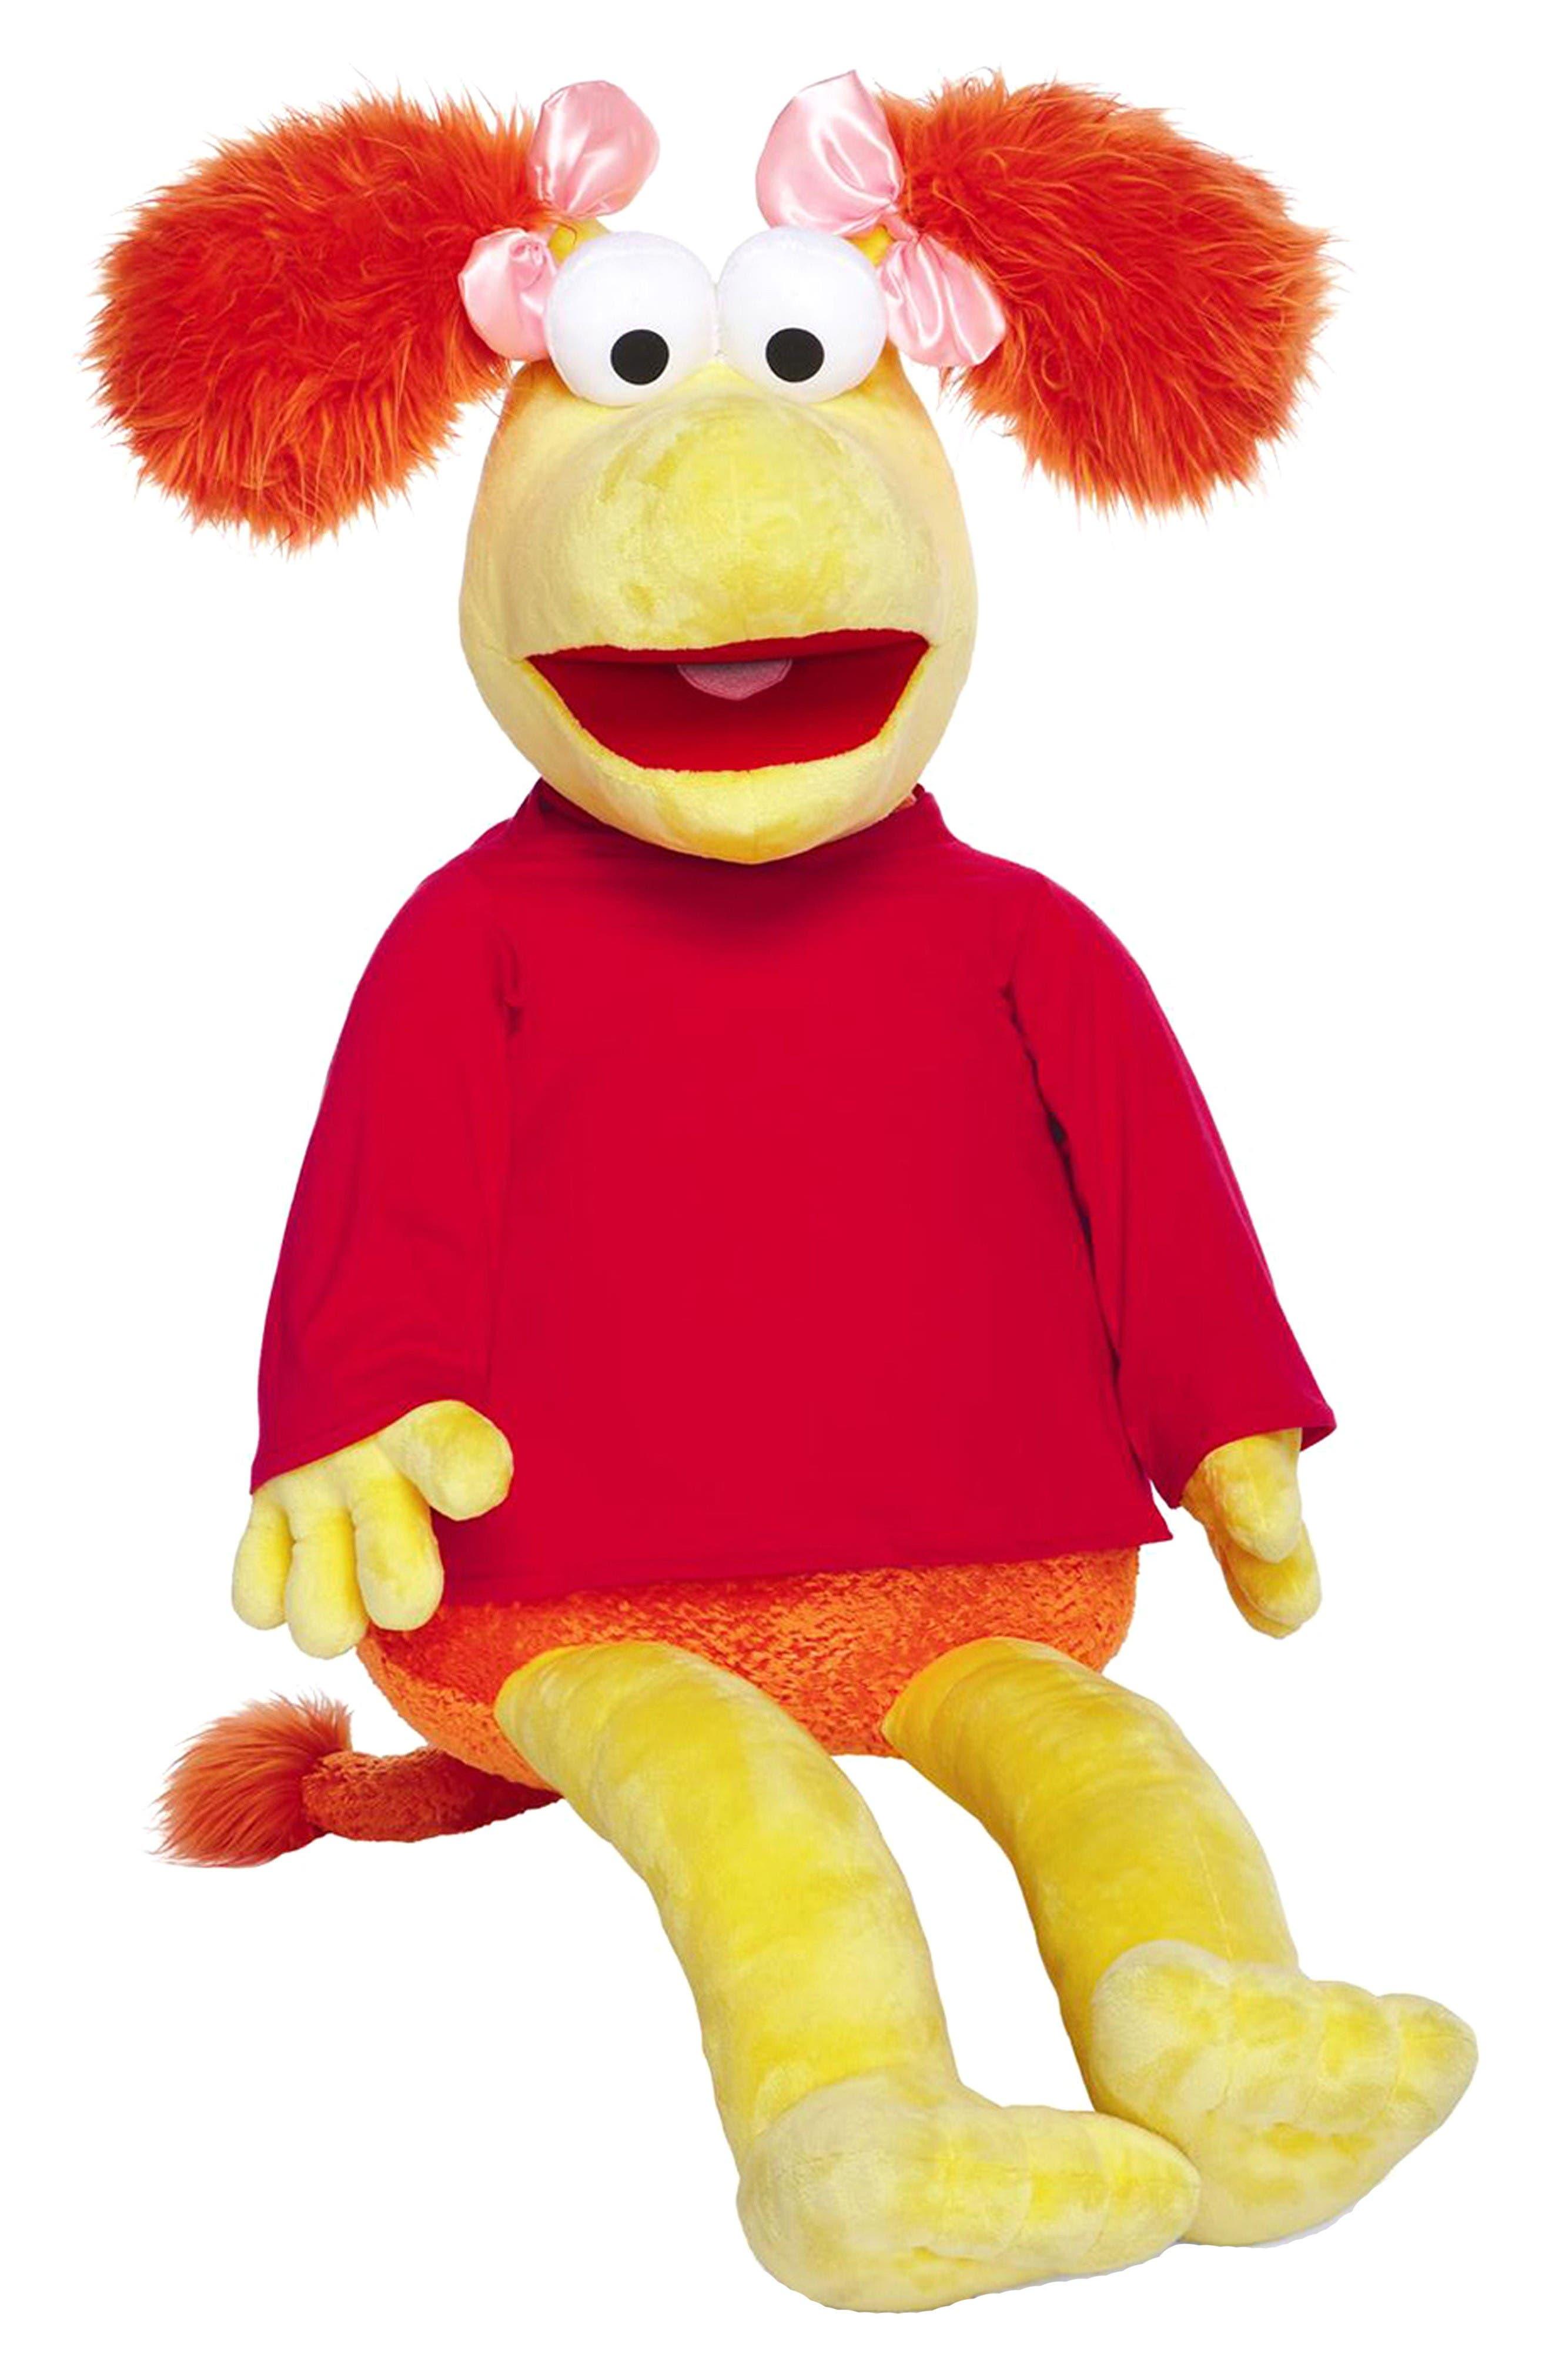 Manhattan Toy Fraggle Rock Jumbo Red Stuffed Animal